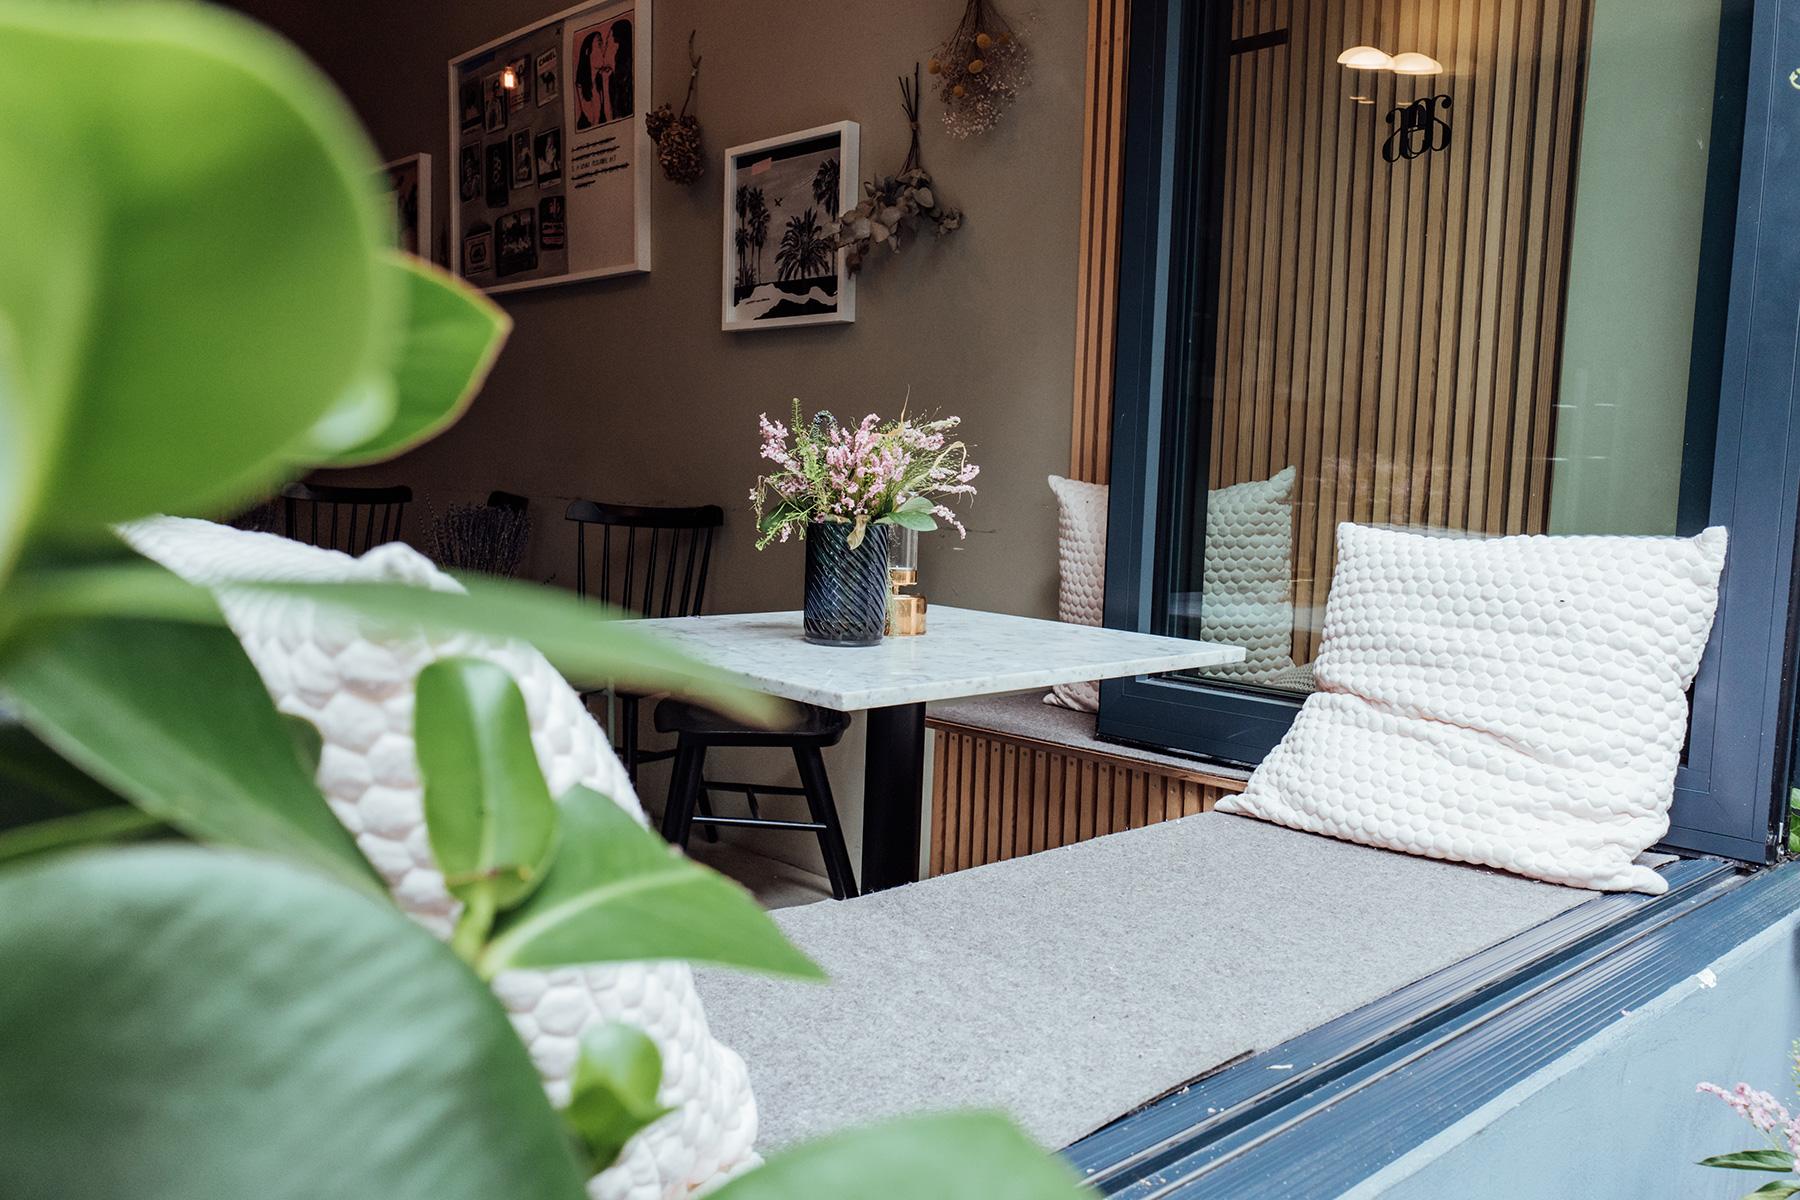 Geheimtipp Hamburg St Pauli Restaurant Haebel Lisa Knauer 14